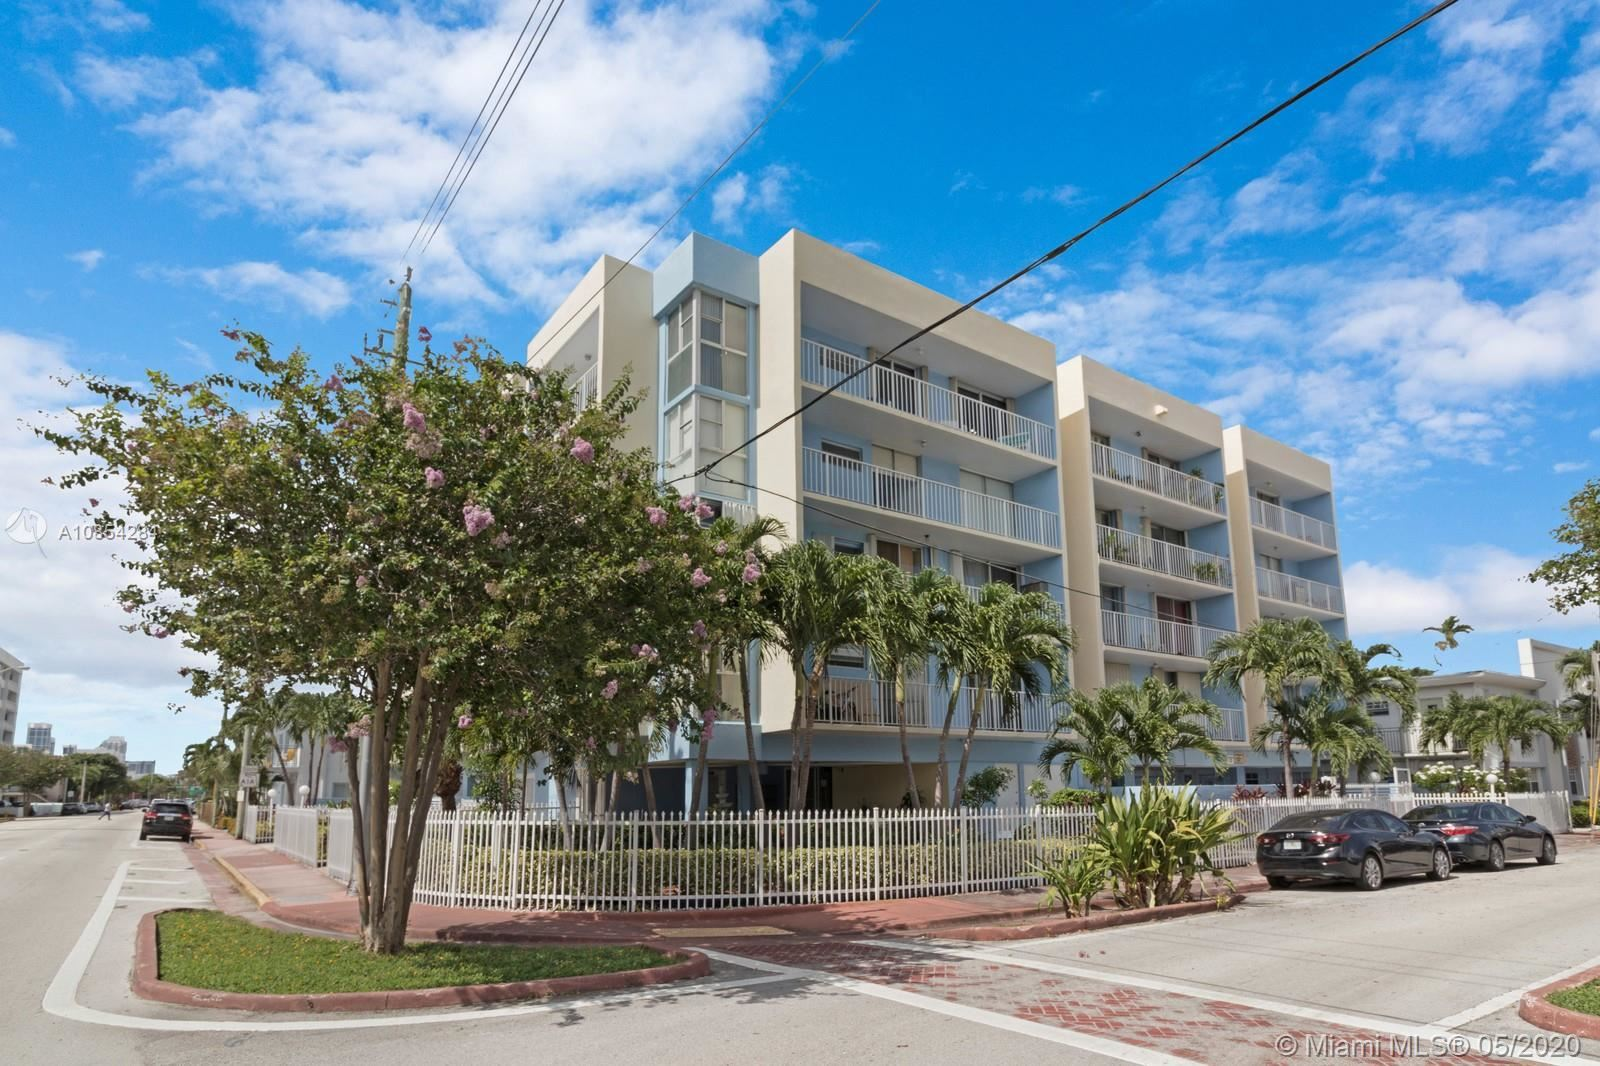 8340 Harding Ave #305, Miami Beach, FL 33141 - #: A10854284